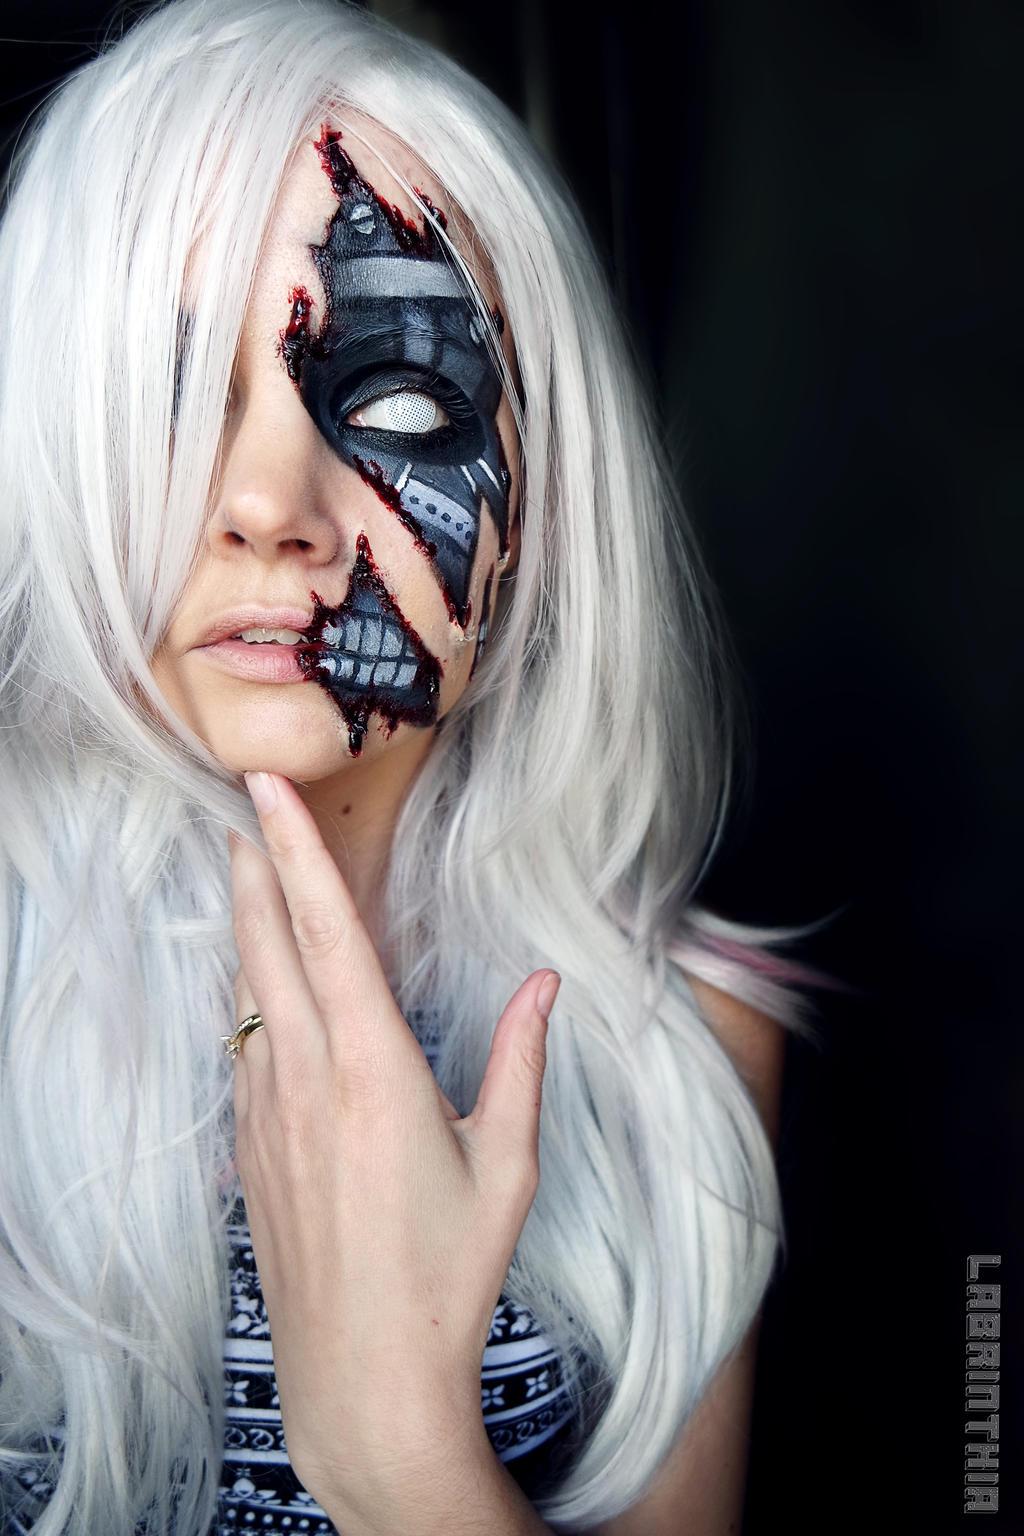 Body Paint Robotic Face Latex